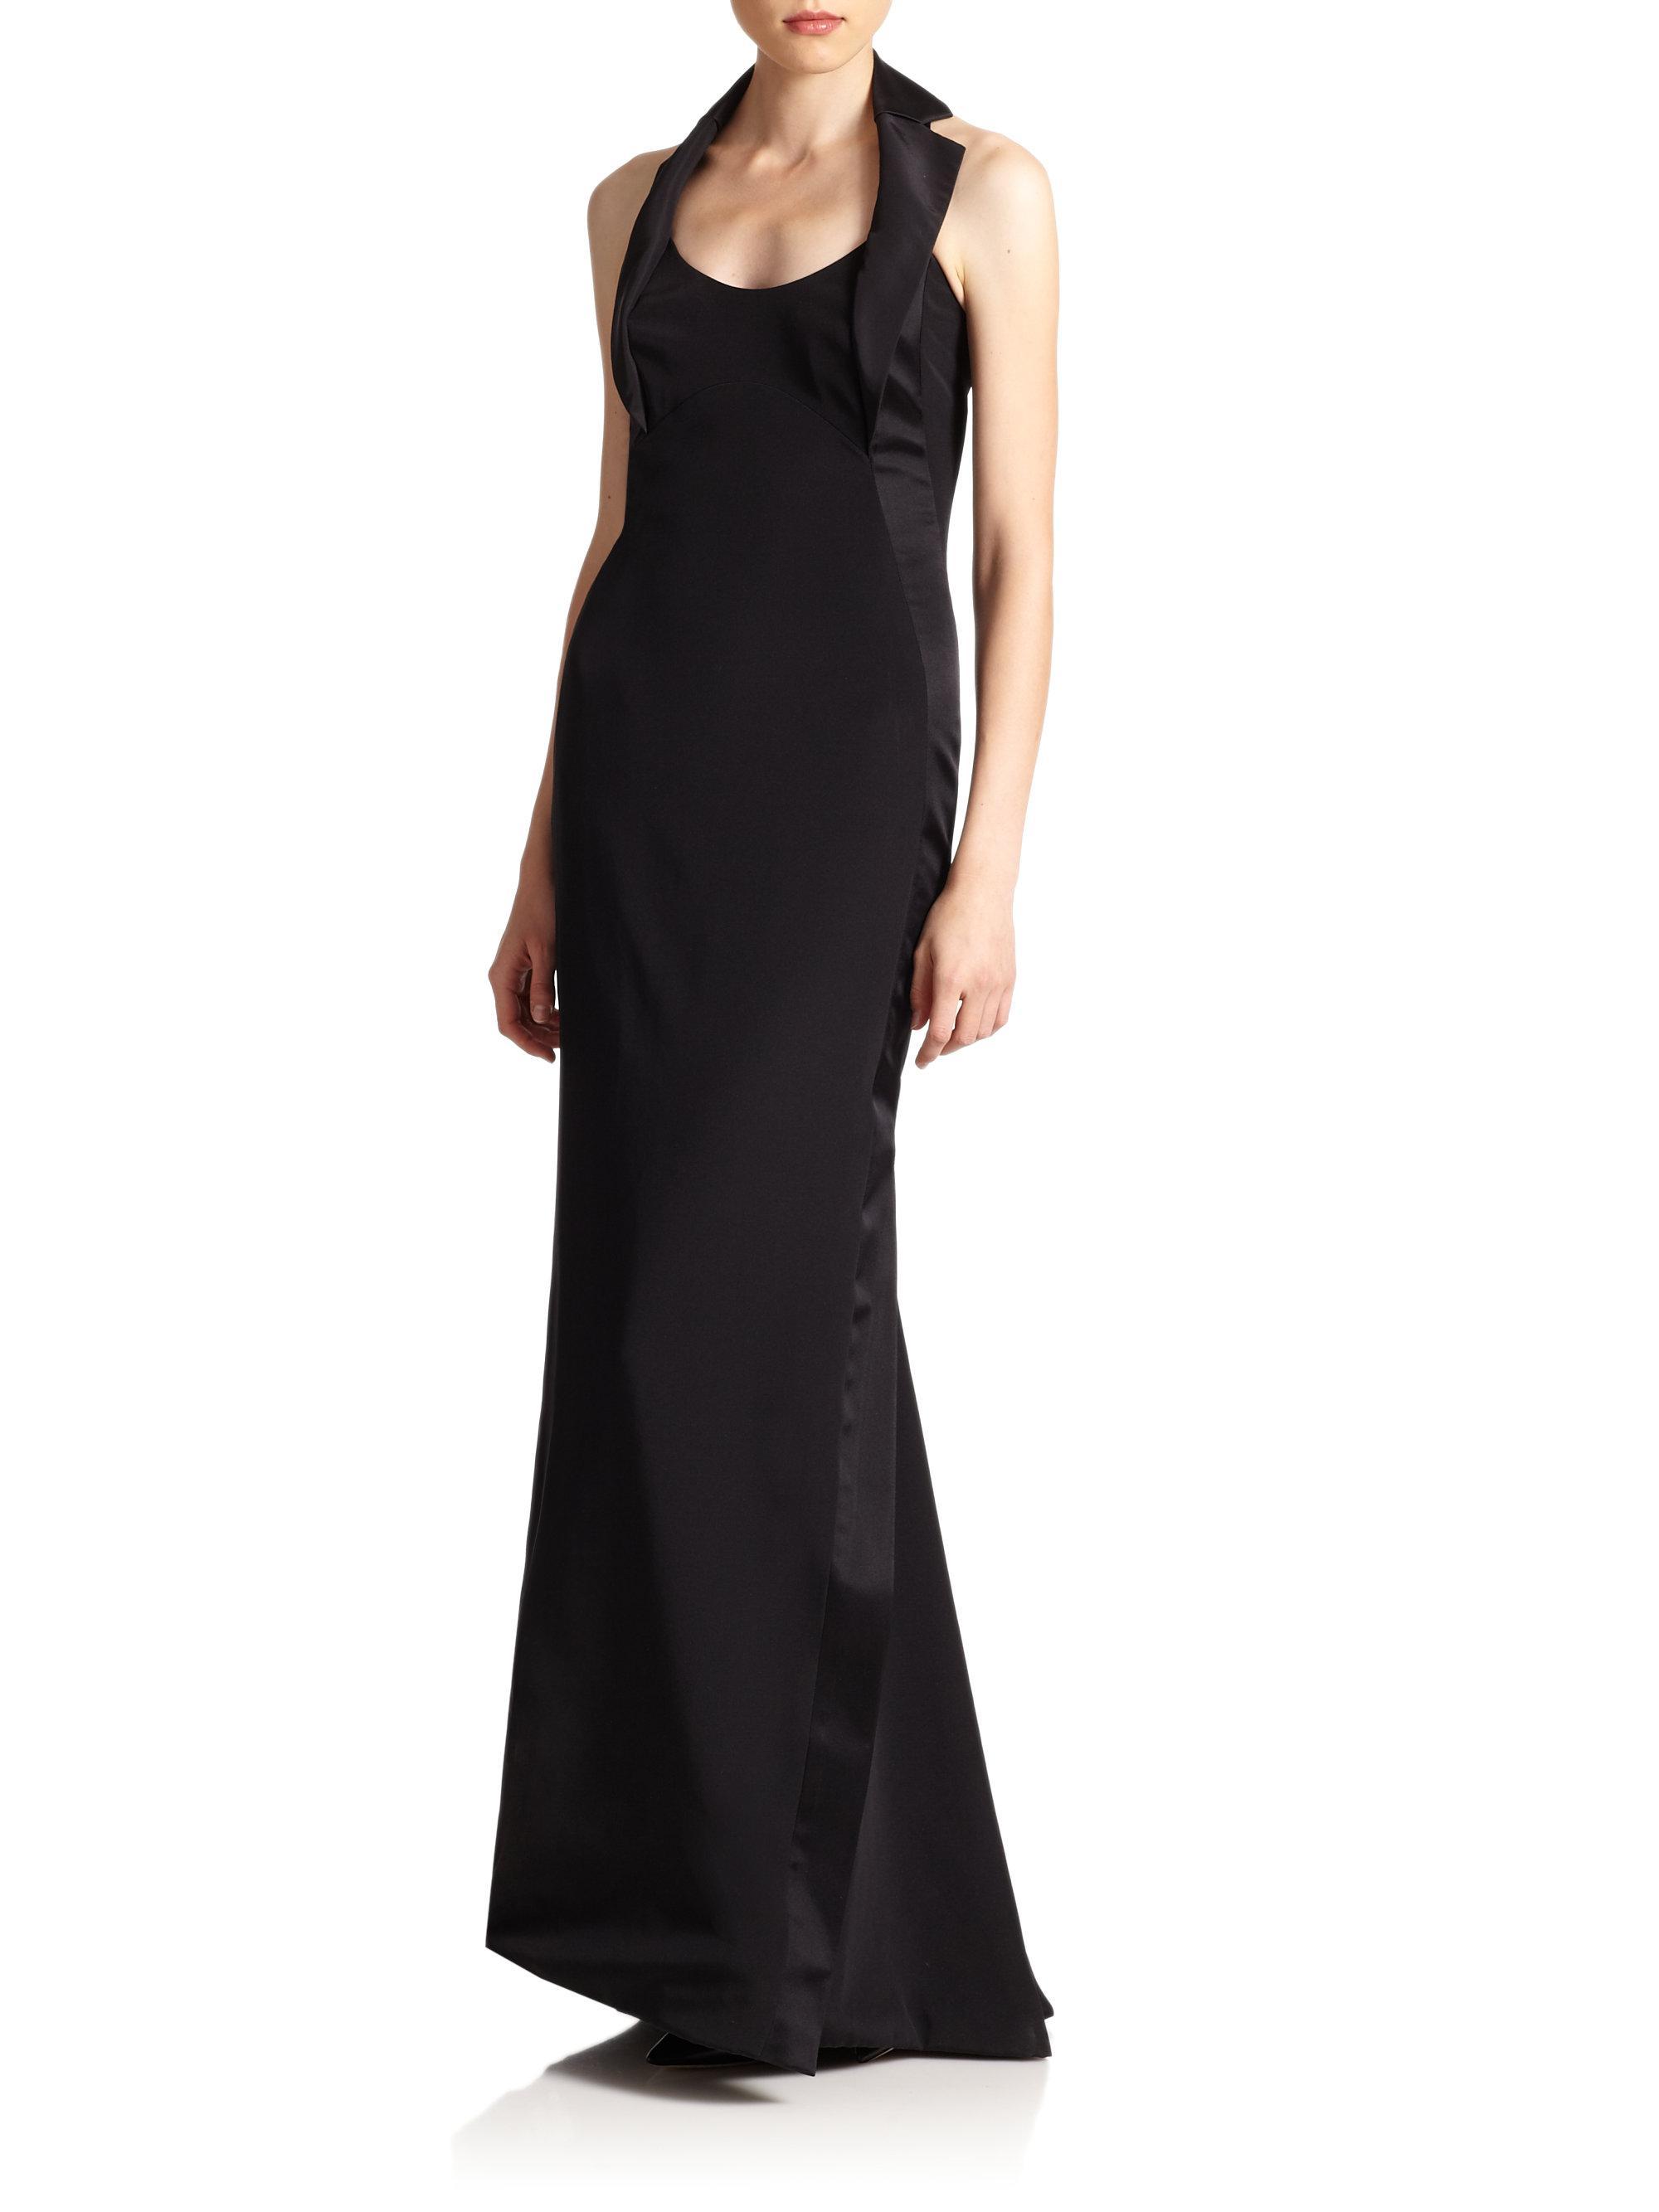 Lyst - Carolina Herrera Icon Collection Silk Tuxedo Gown in Black